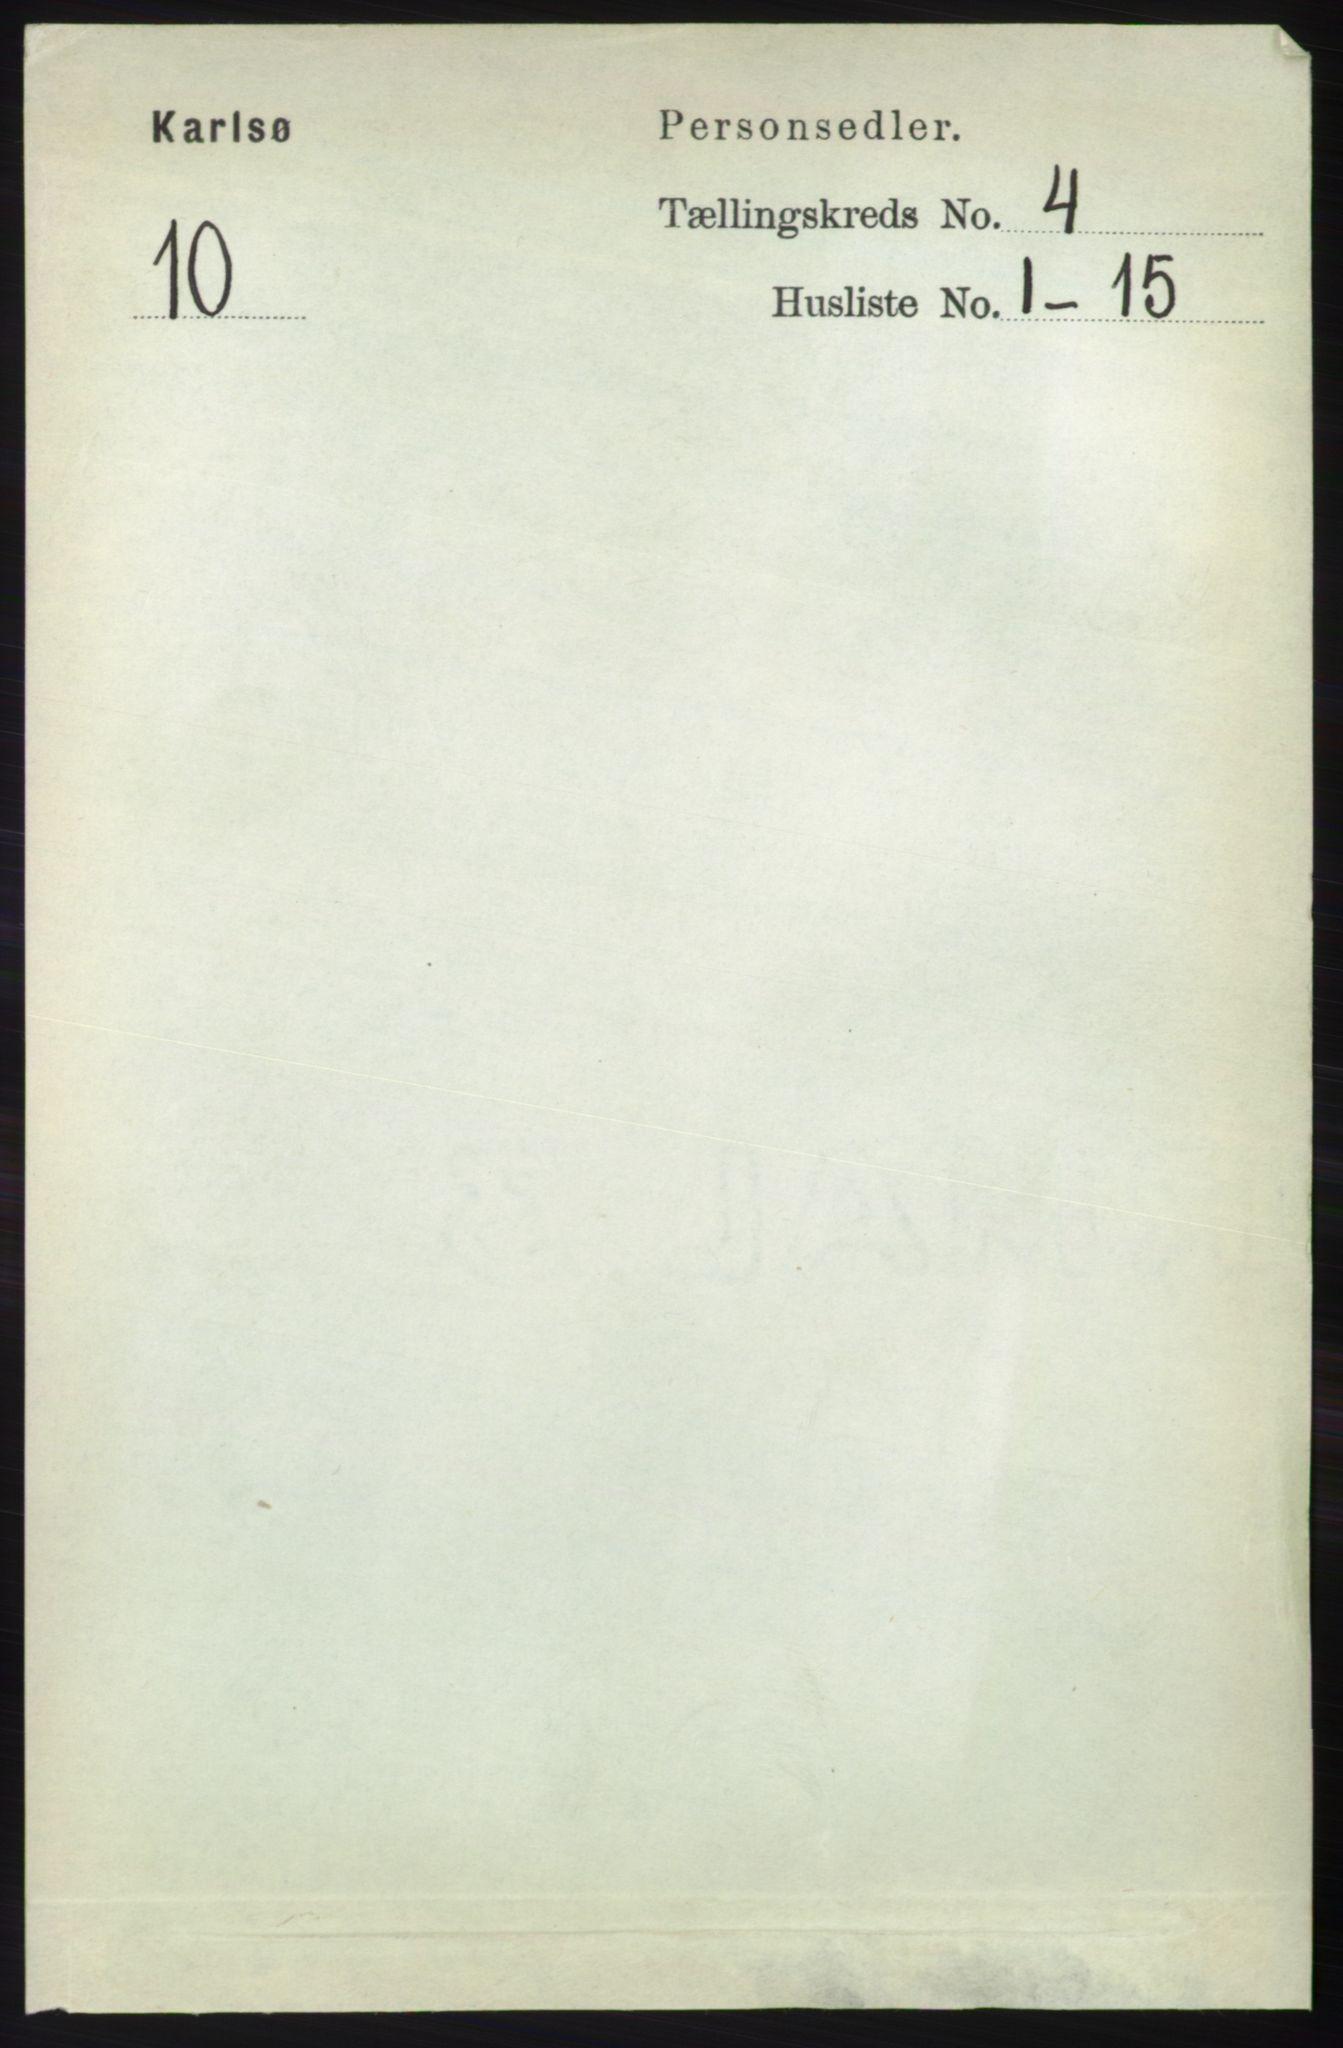 RA, Folketelling 1891 for 1936 Karlsøy herred, 1891, s. 828